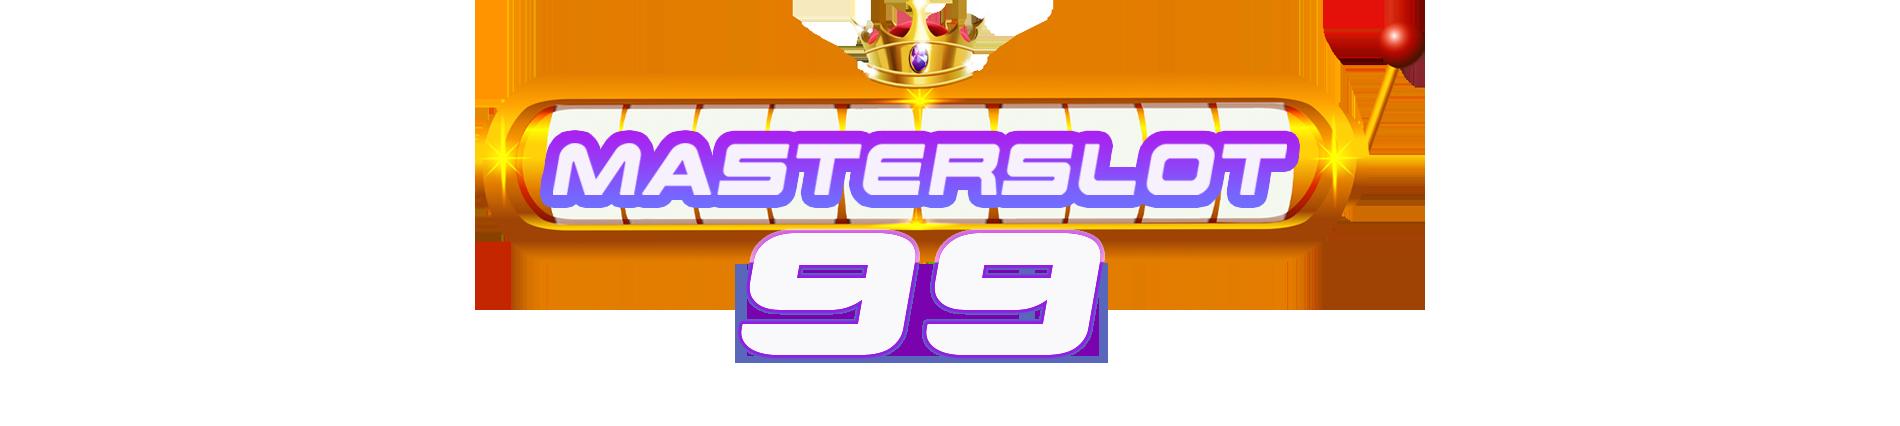 MASTERSLOT99 ragmatic Slot Deposit Pulsa Tanpa PotPongan 2021